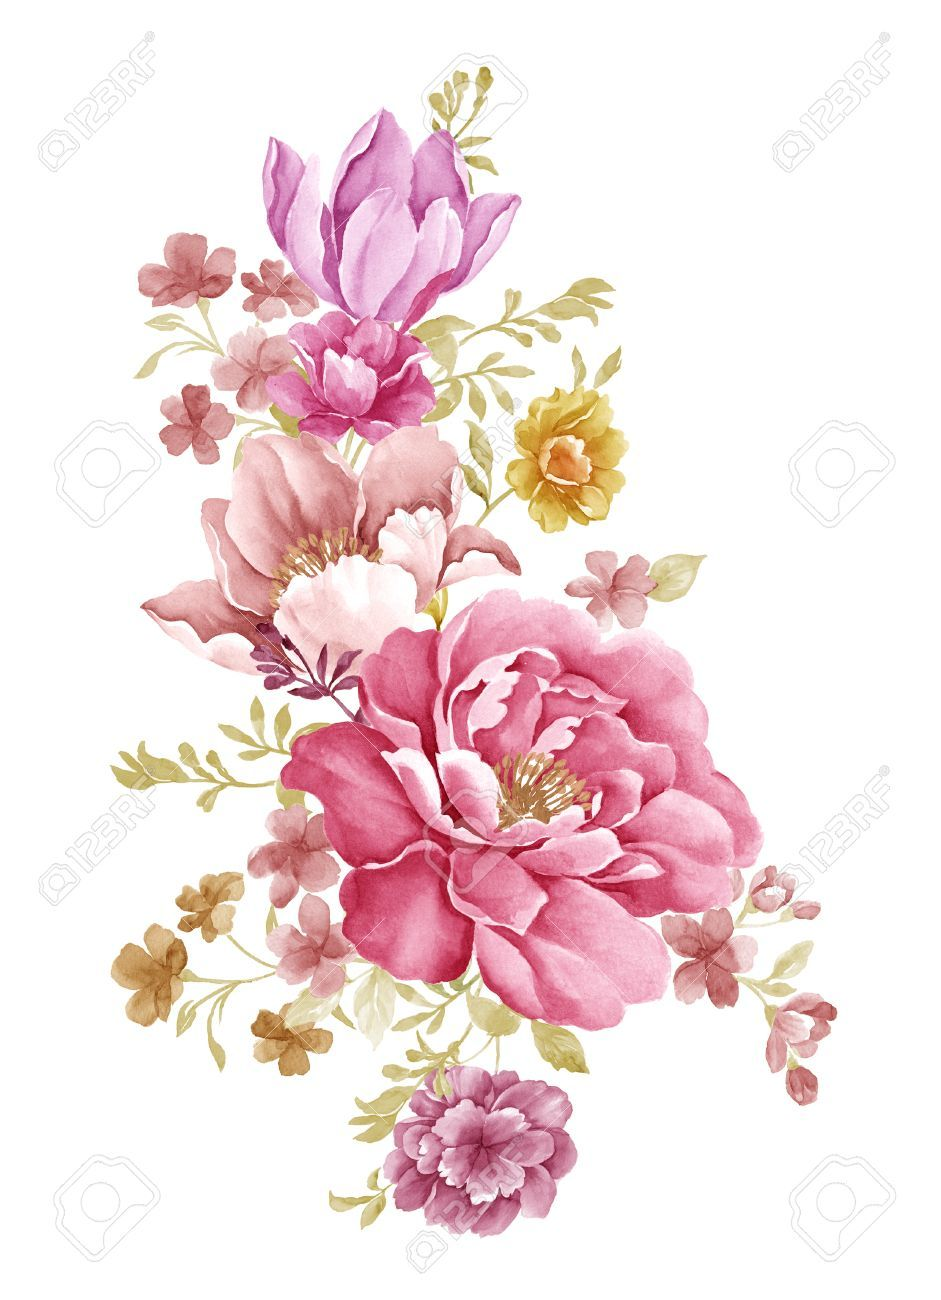 Flower illustration classic google flower pattern for Watercolor flower images